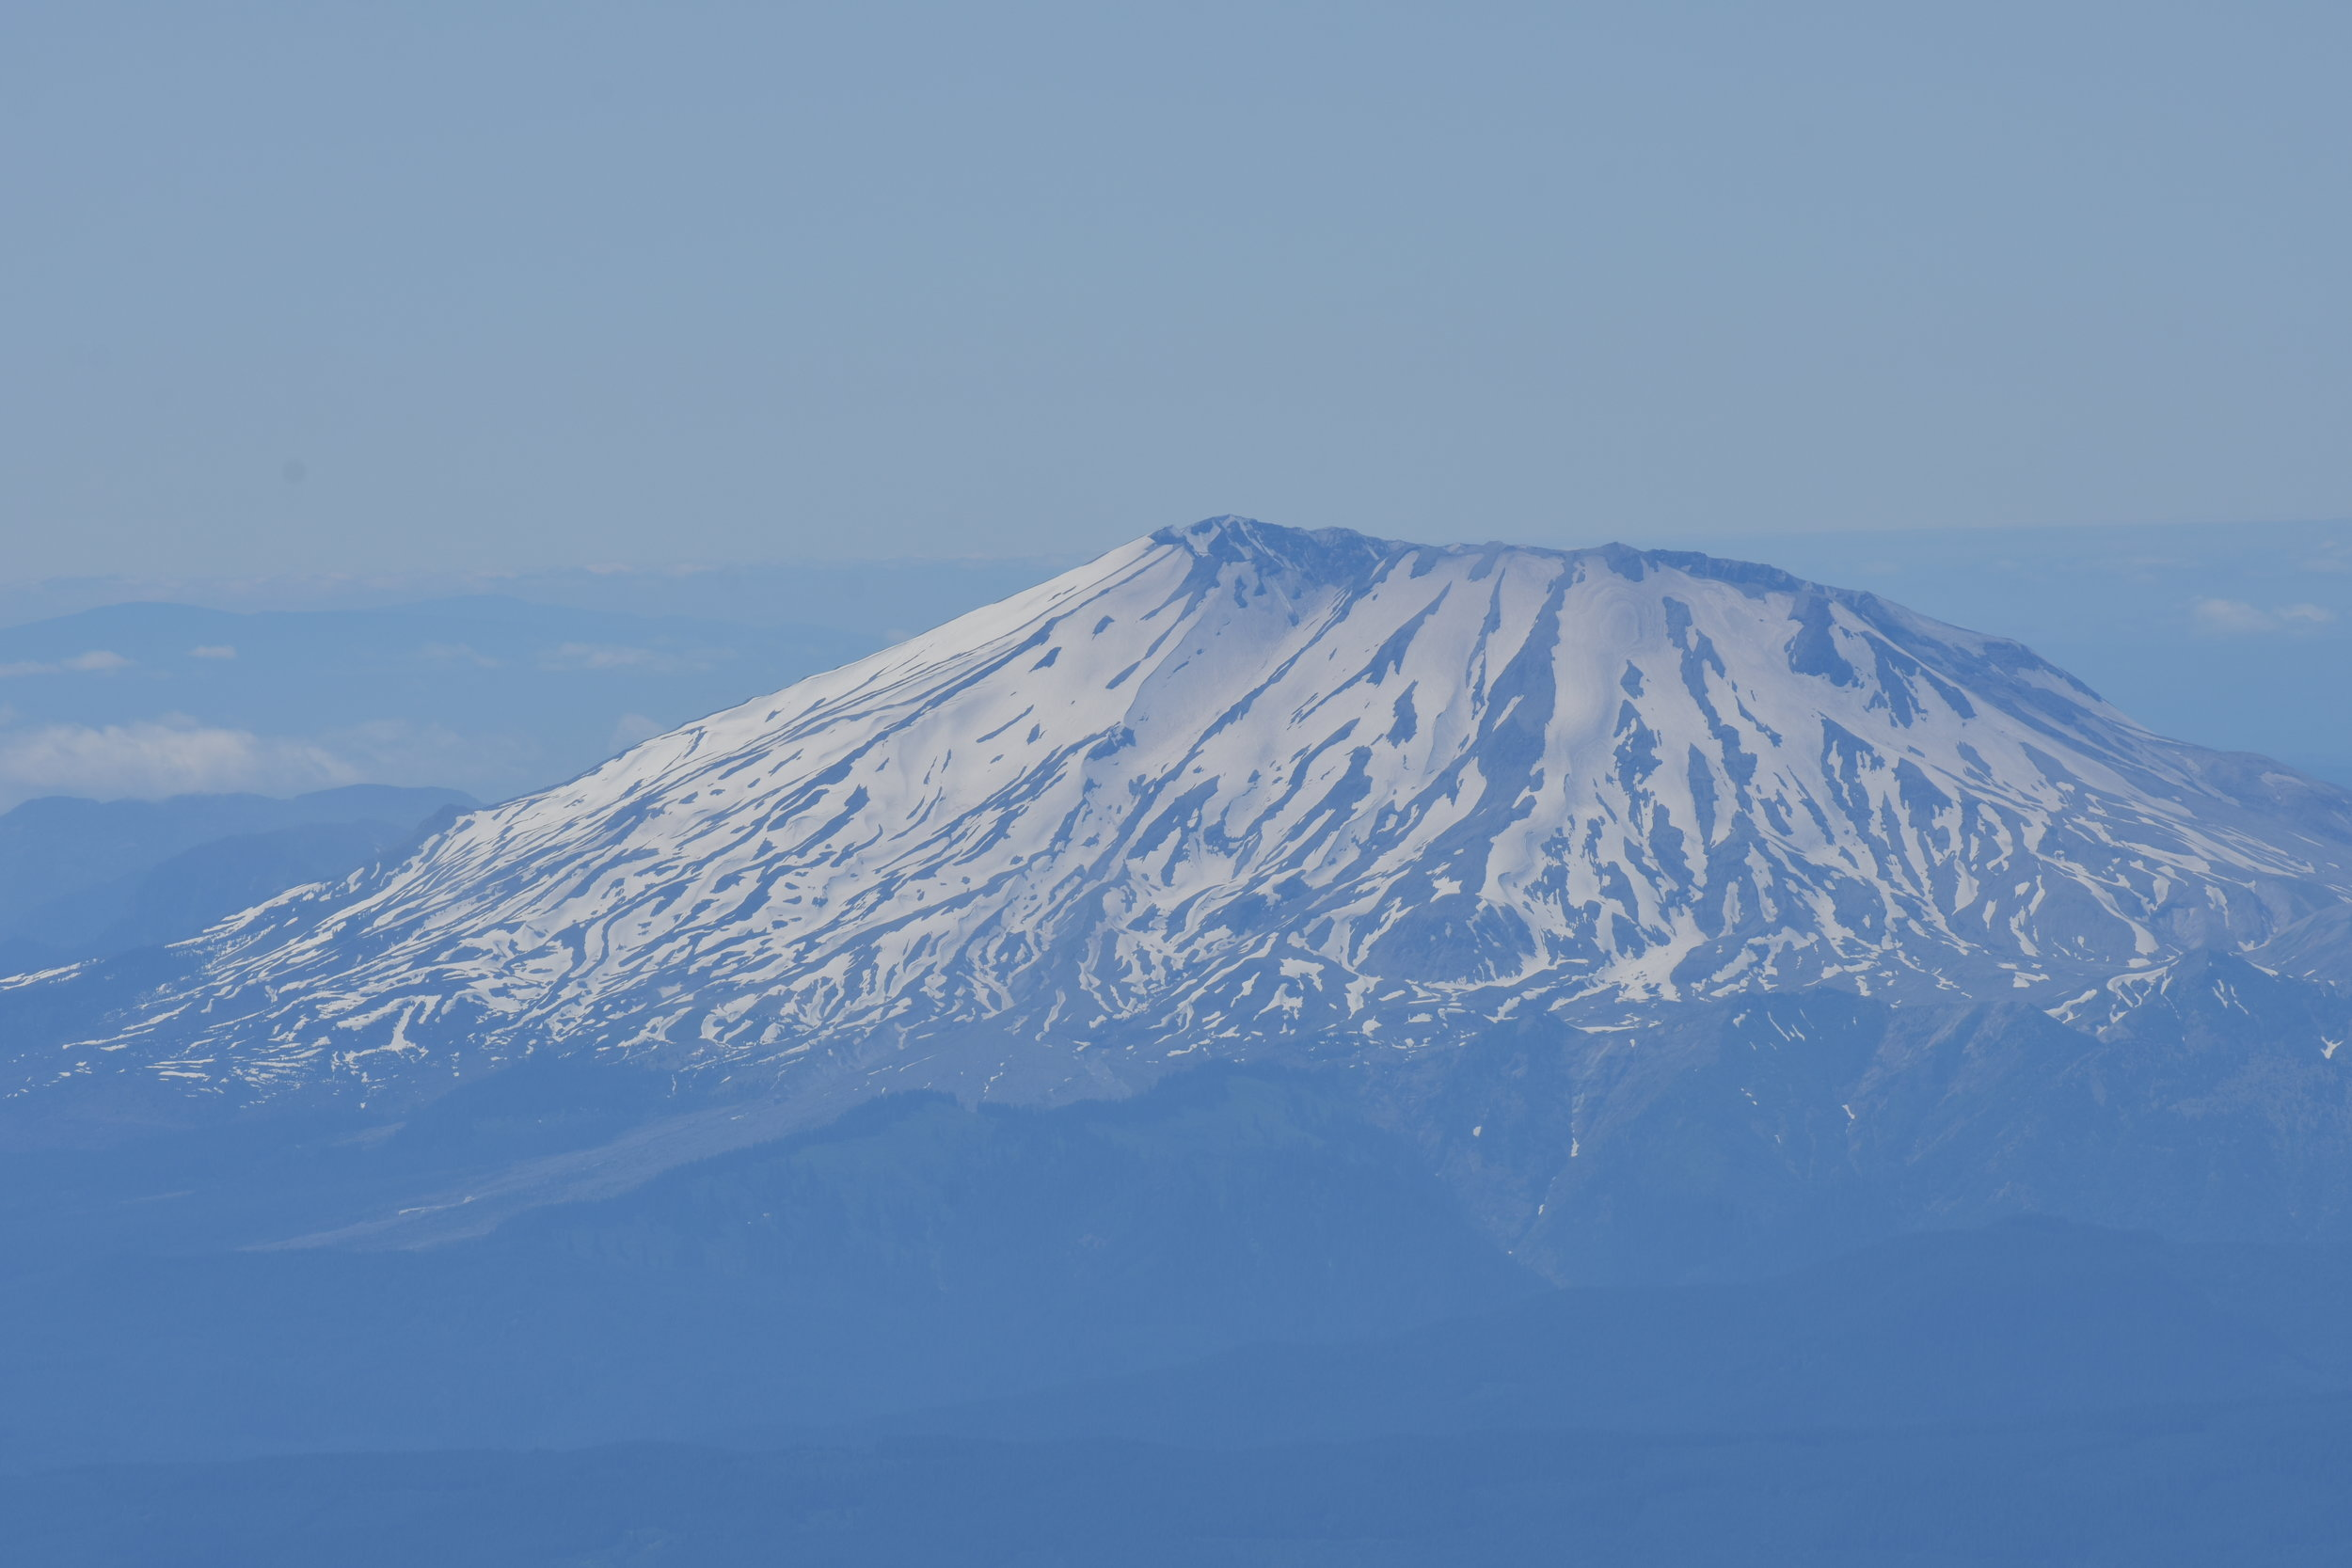 Mt. Saint Helens; such a strange distribution of snow